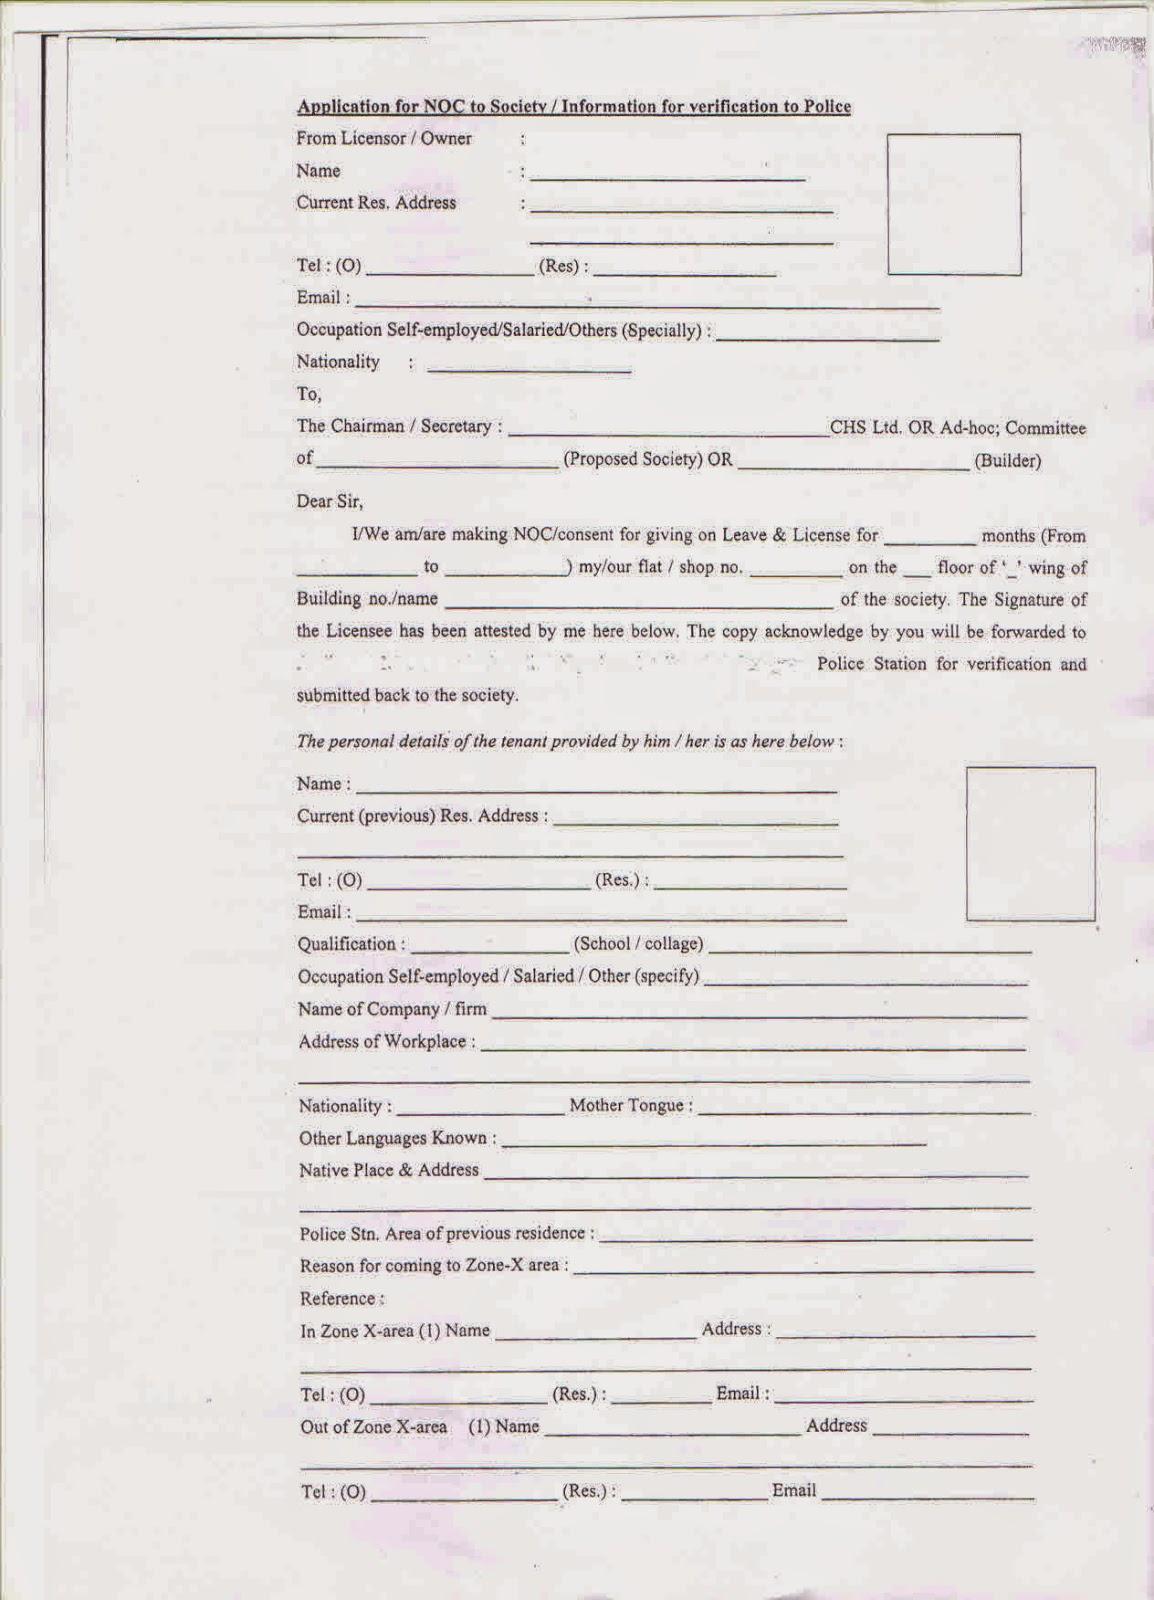 Sahakarsutra Police Verification Format For A Cooperative